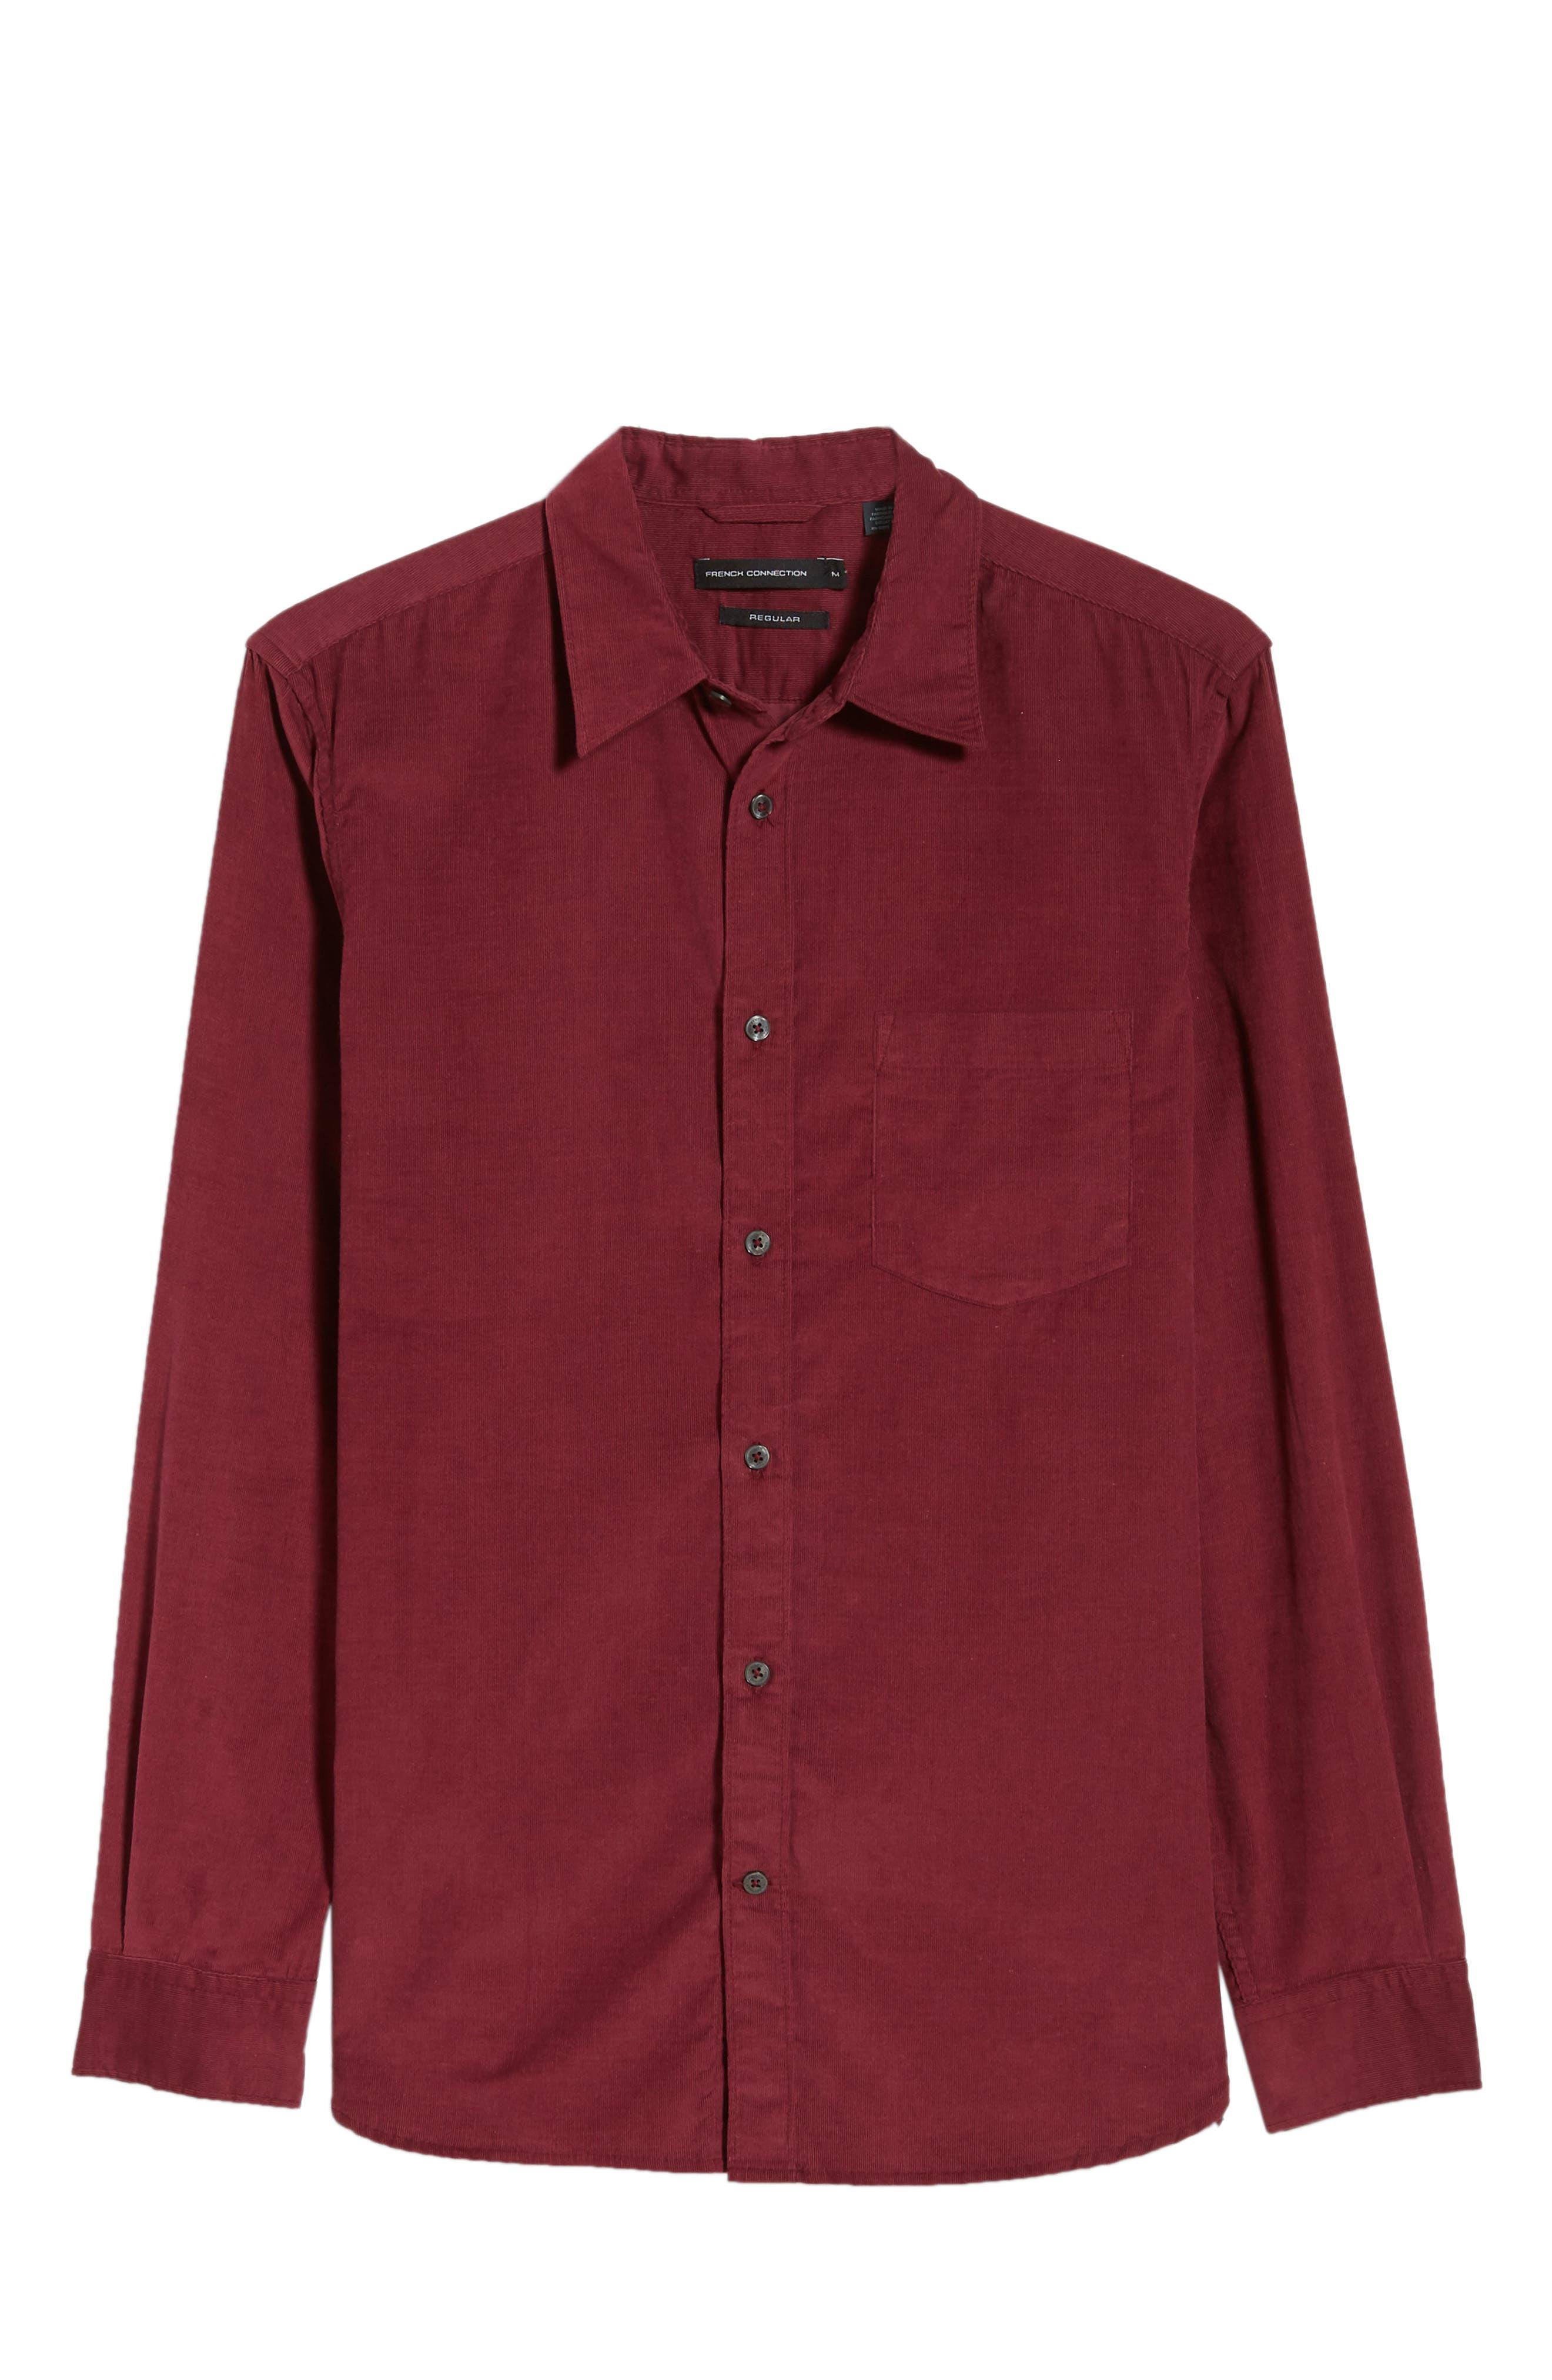 28 Wales Regular Fit Corduroy Shirt,                             Alternate thumbnail 5, color,                             RASPBERRY BERET